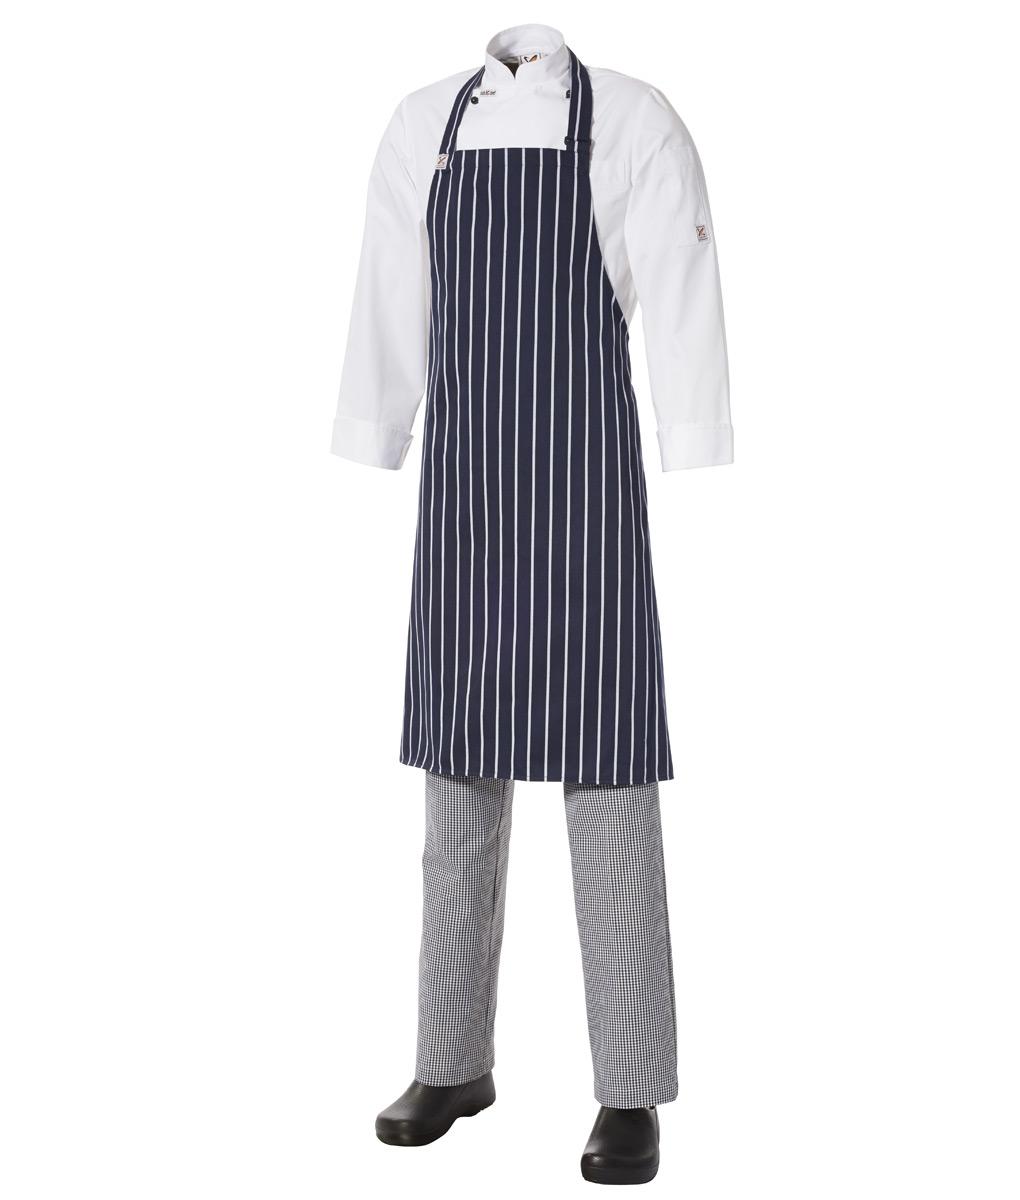 Bib Apron Pinstripe – Medium by Club Chef Aprons 2